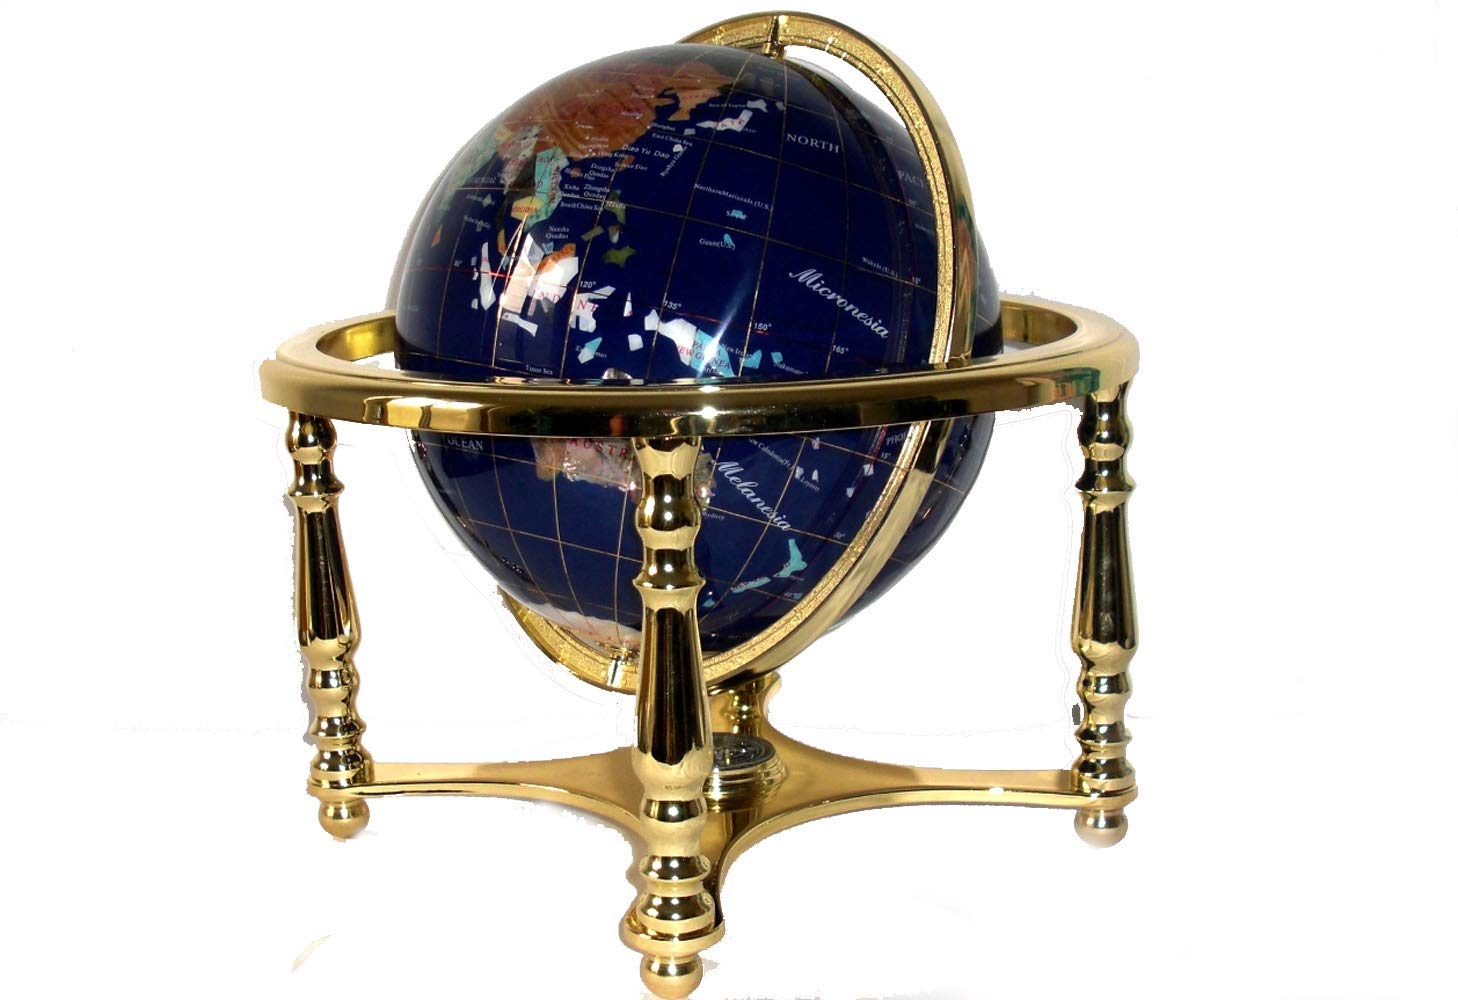 Unique Art 13 Tall Amber Pearl Ocean Gemstone Globe w Tripod Copper Stand